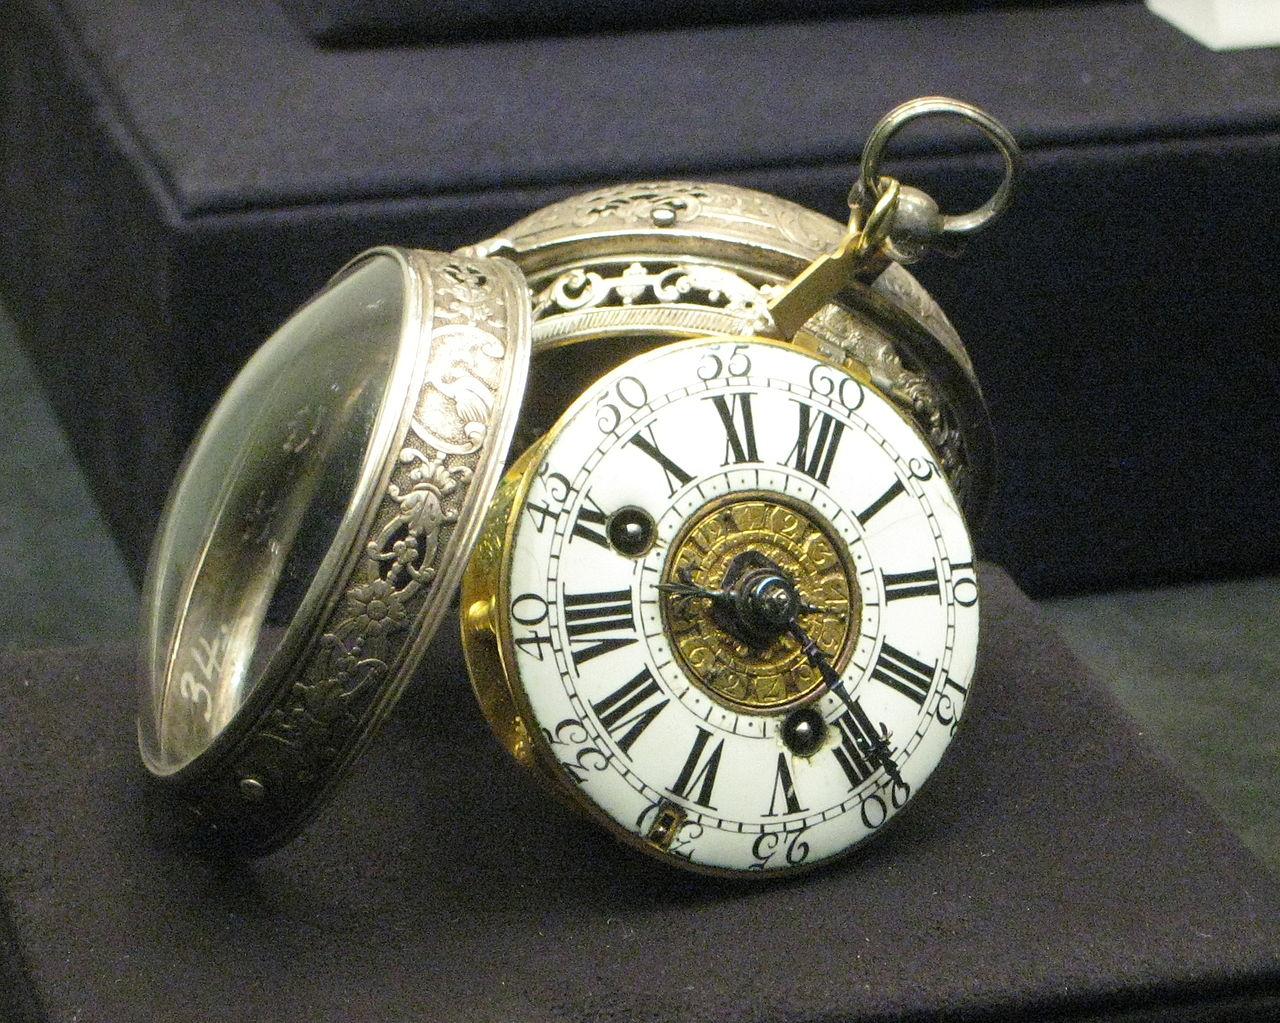 Fondation de la Haute Horlogerie (Kremlin exhibition) by shakko 32.jpg